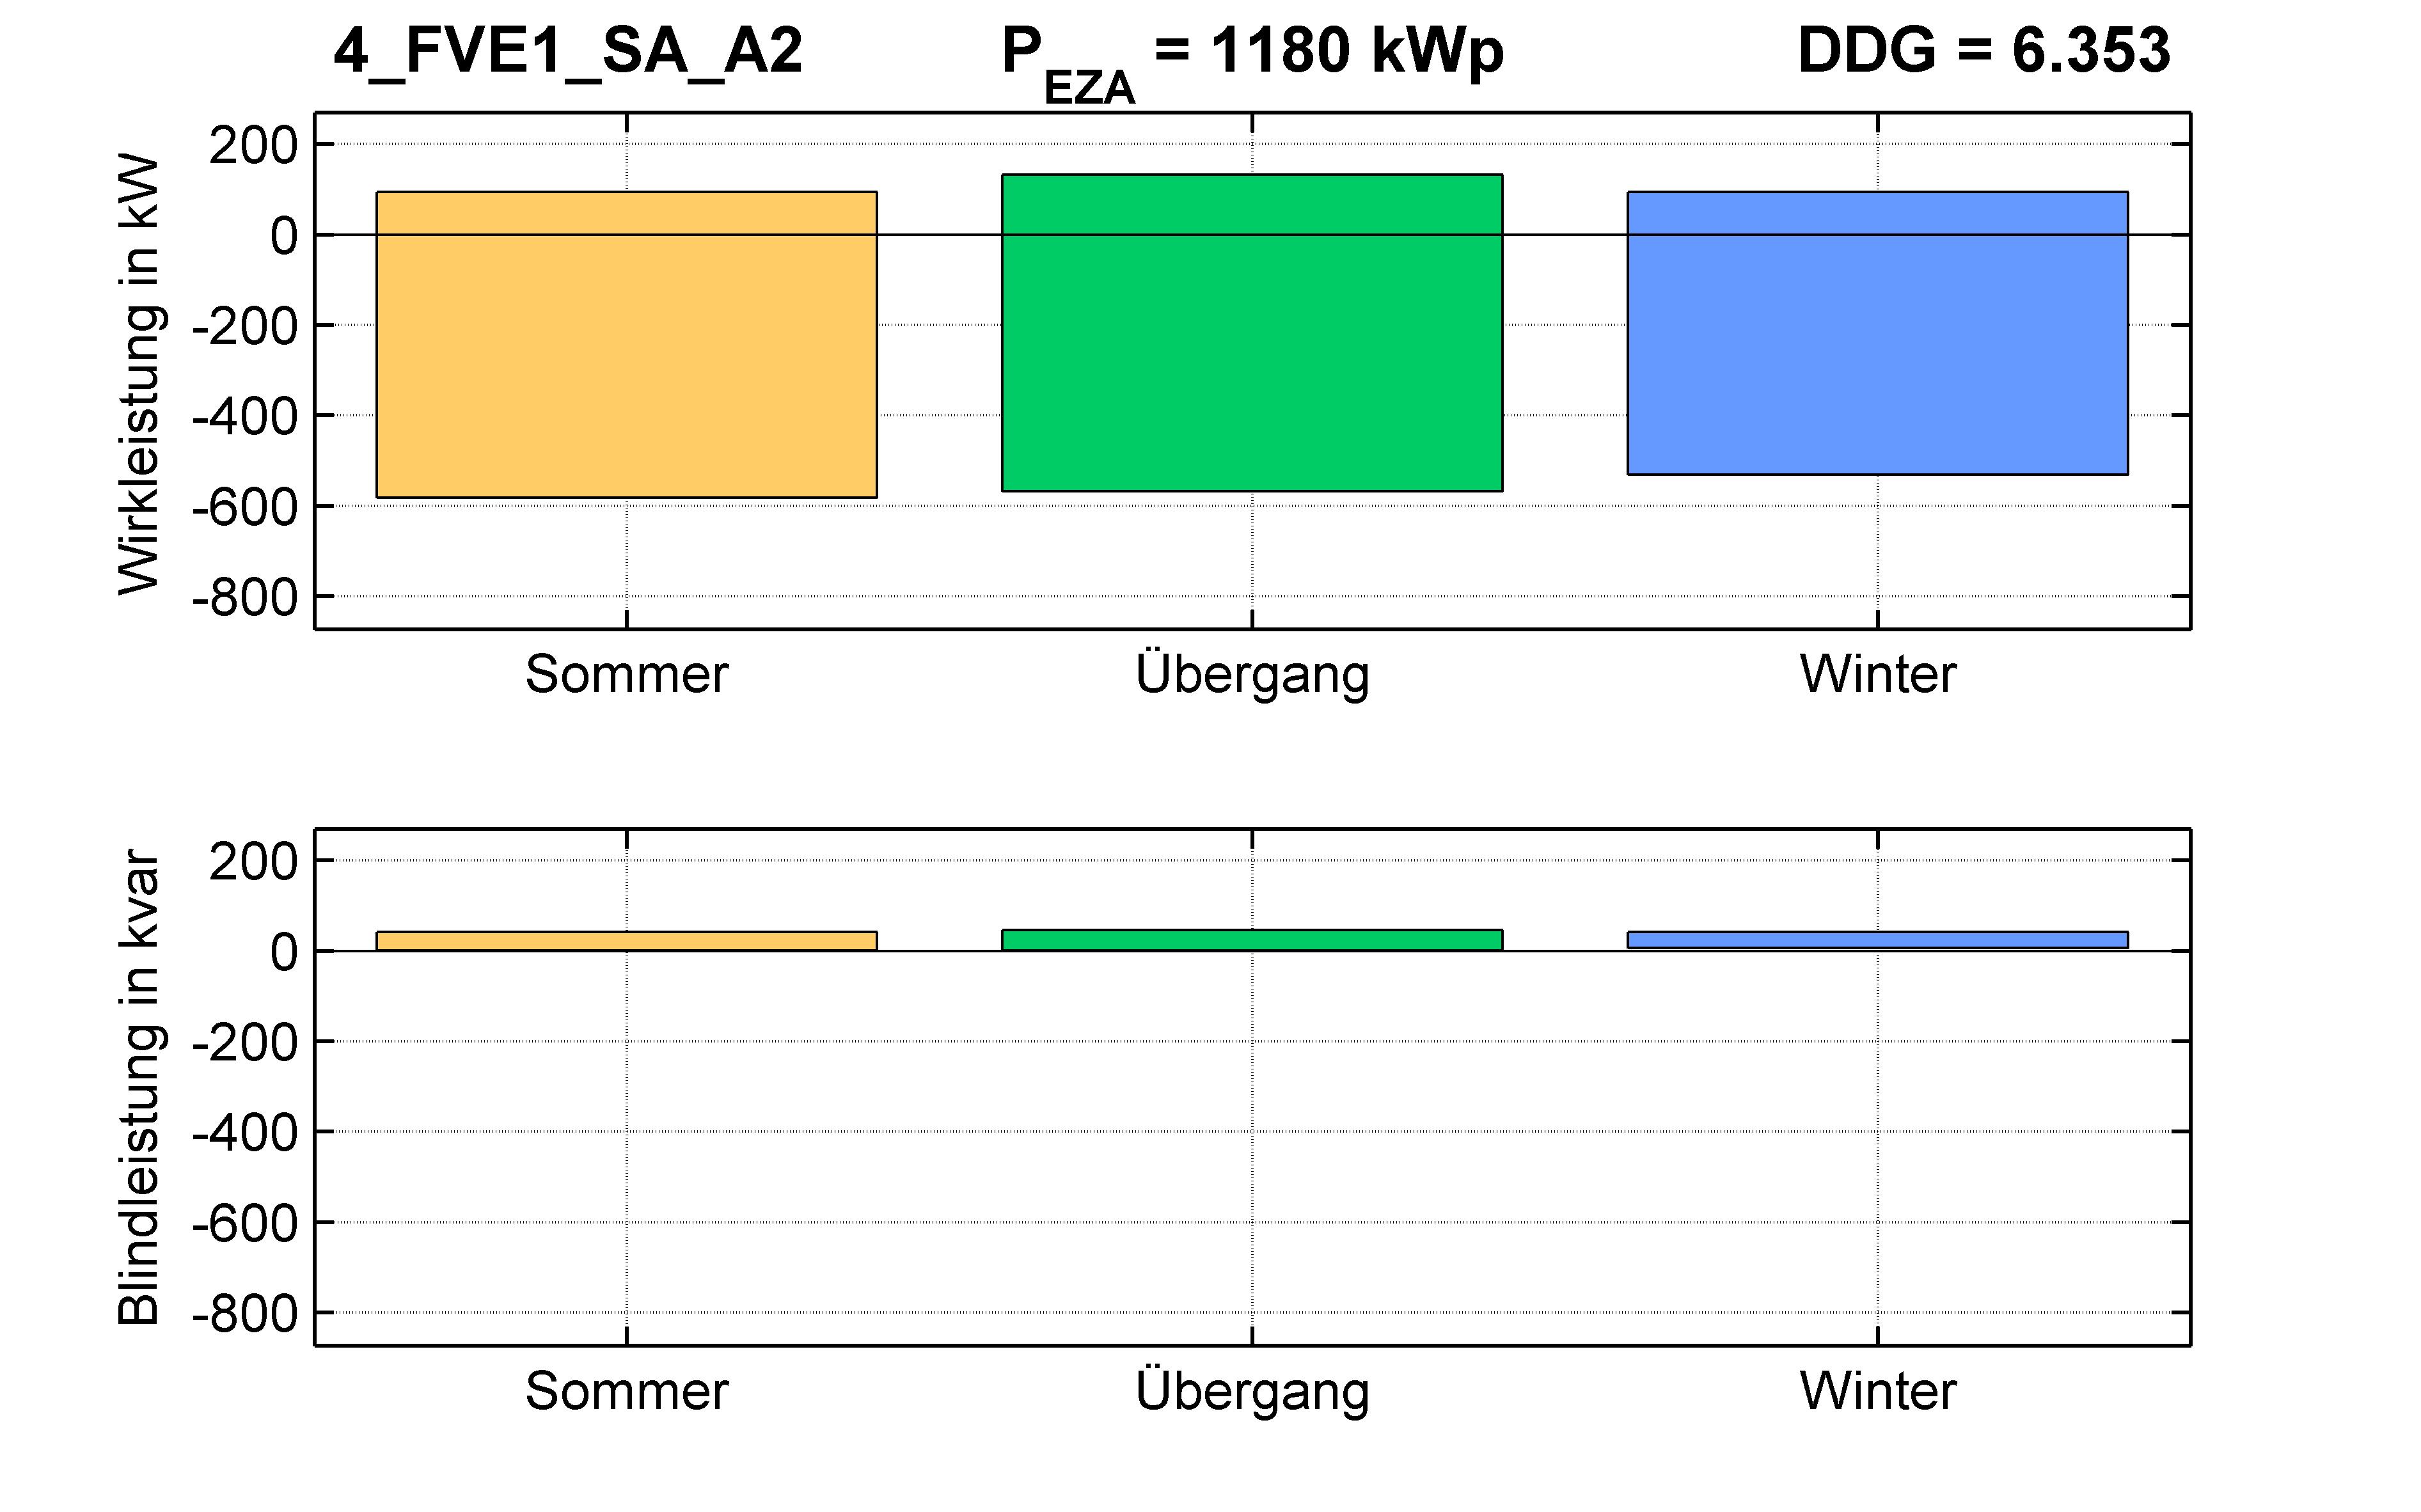 FVE1 | P-Kappung 55% (SA) A2 | PQ-Bilanz